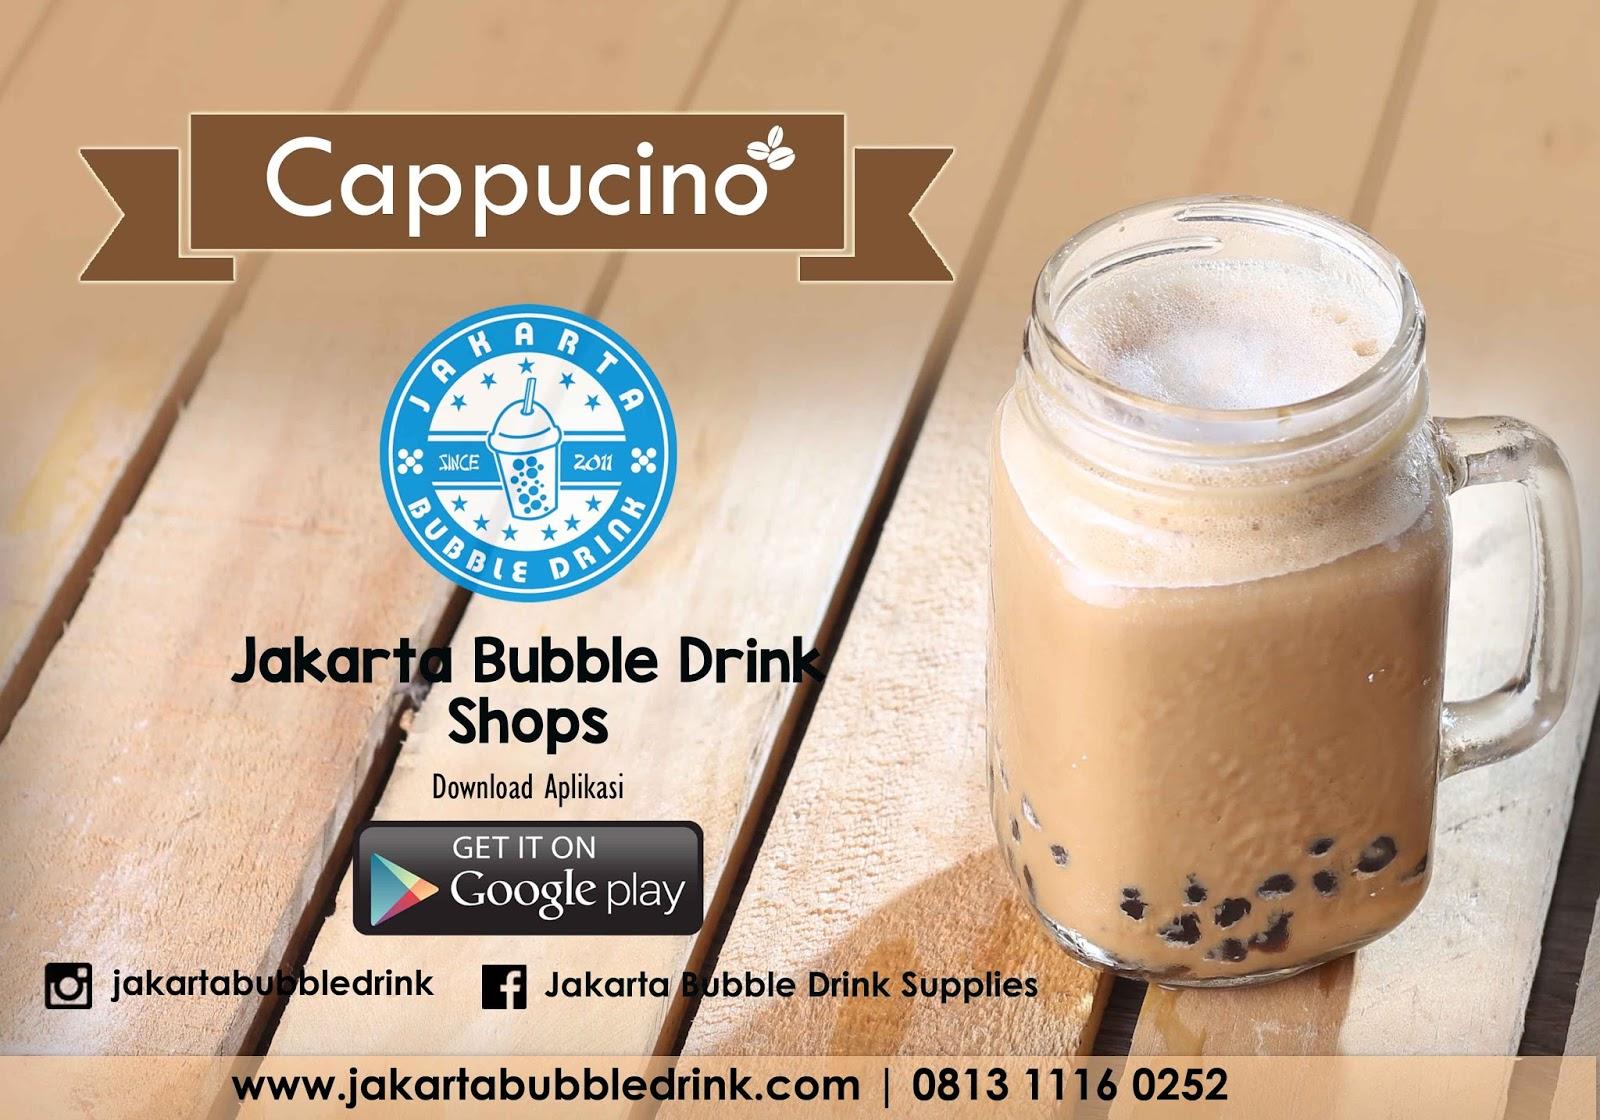 Grosir Powder Bubble Drink Jakarta November 2016 Kopi Jahe By Bintan Pal 081311160252 Jual Bubuk Cappucino Kilonan Murah